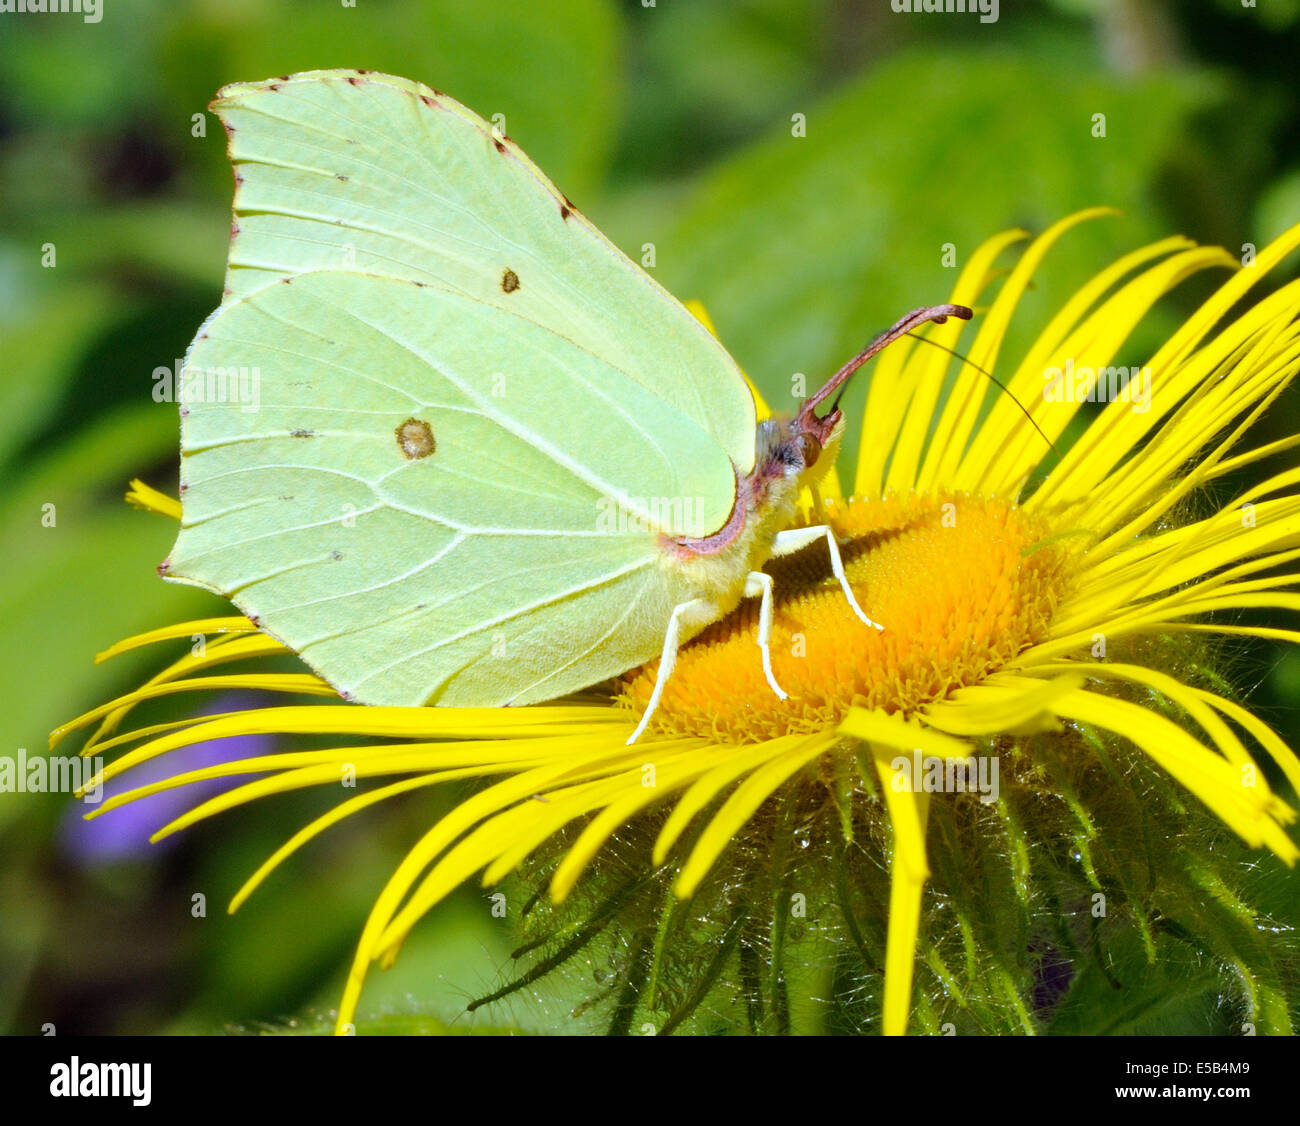 A  Brimstone Butterfly (Gonepteryx rhamni) feeds on a yellow Inula hookeri flower. Stock Photo